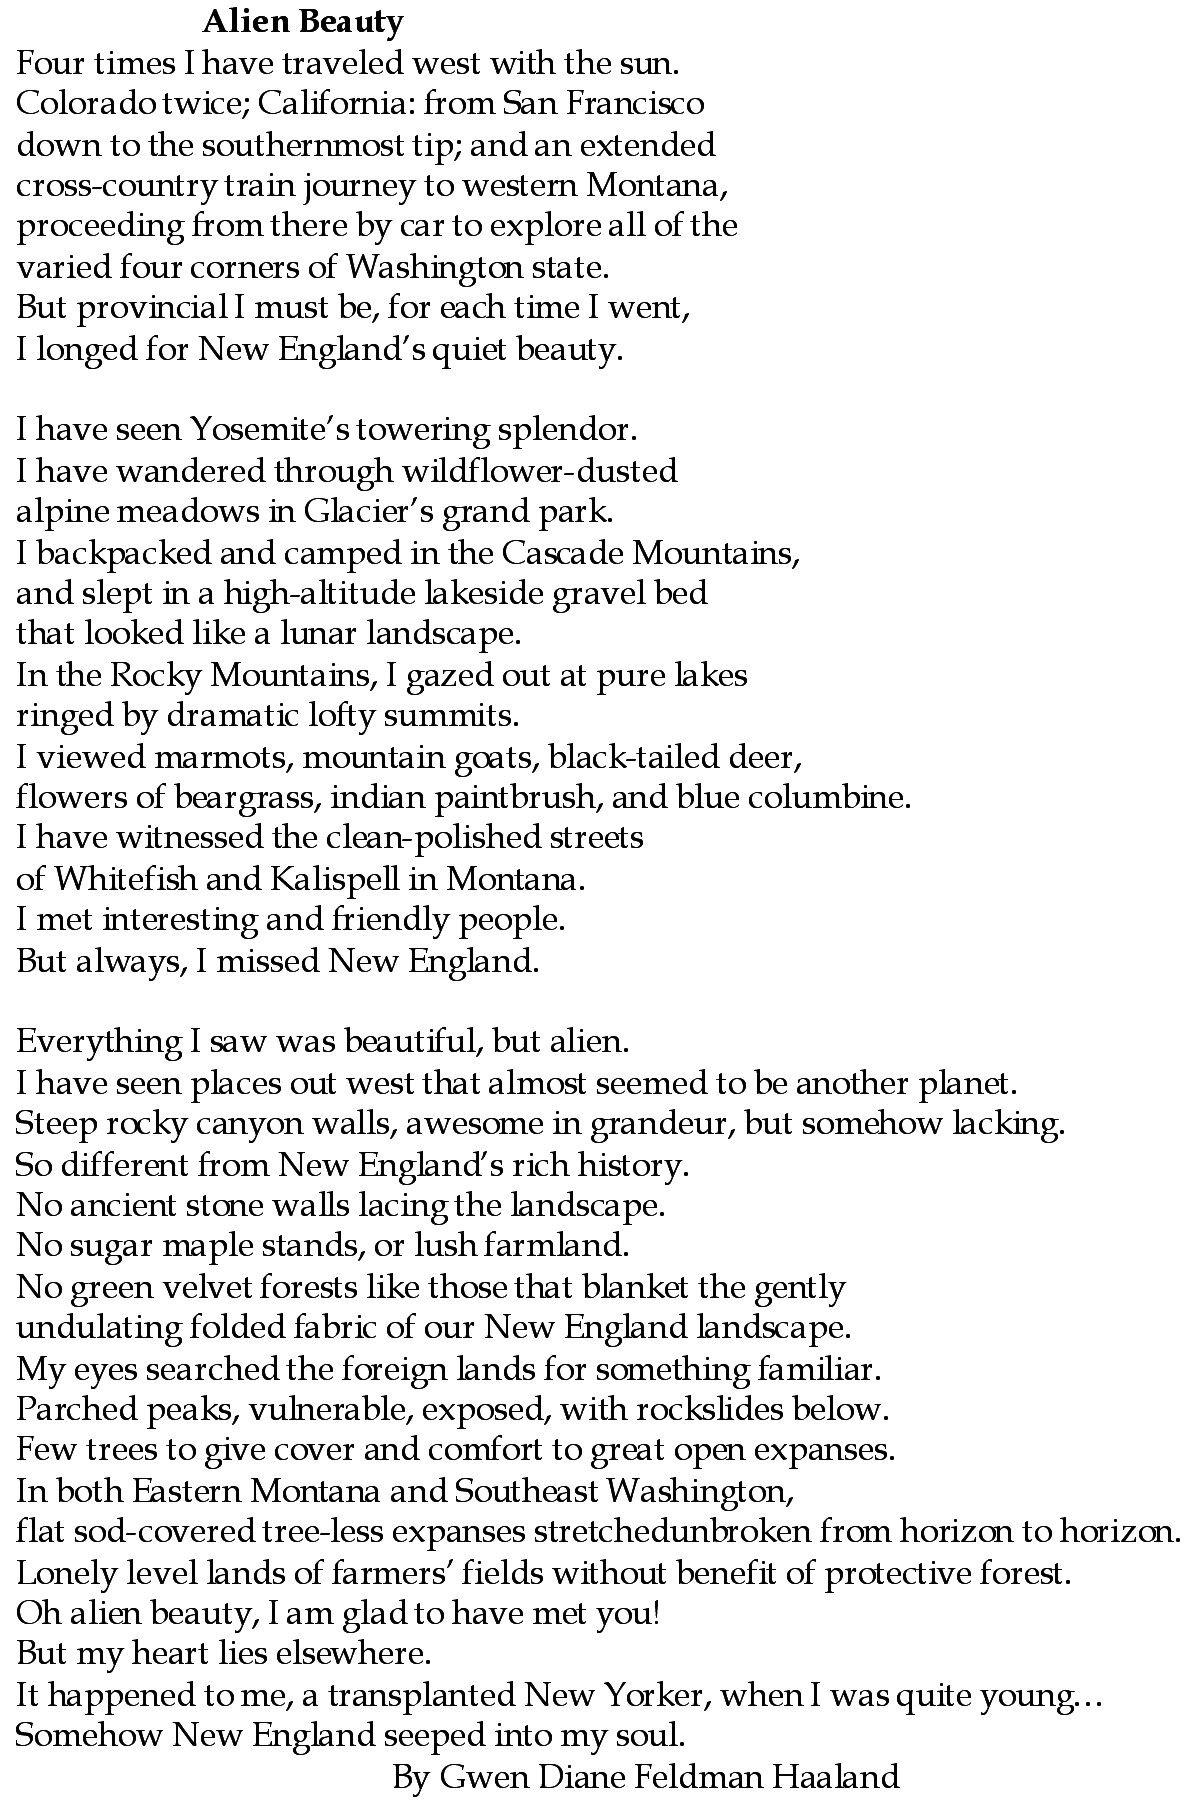 alien poem